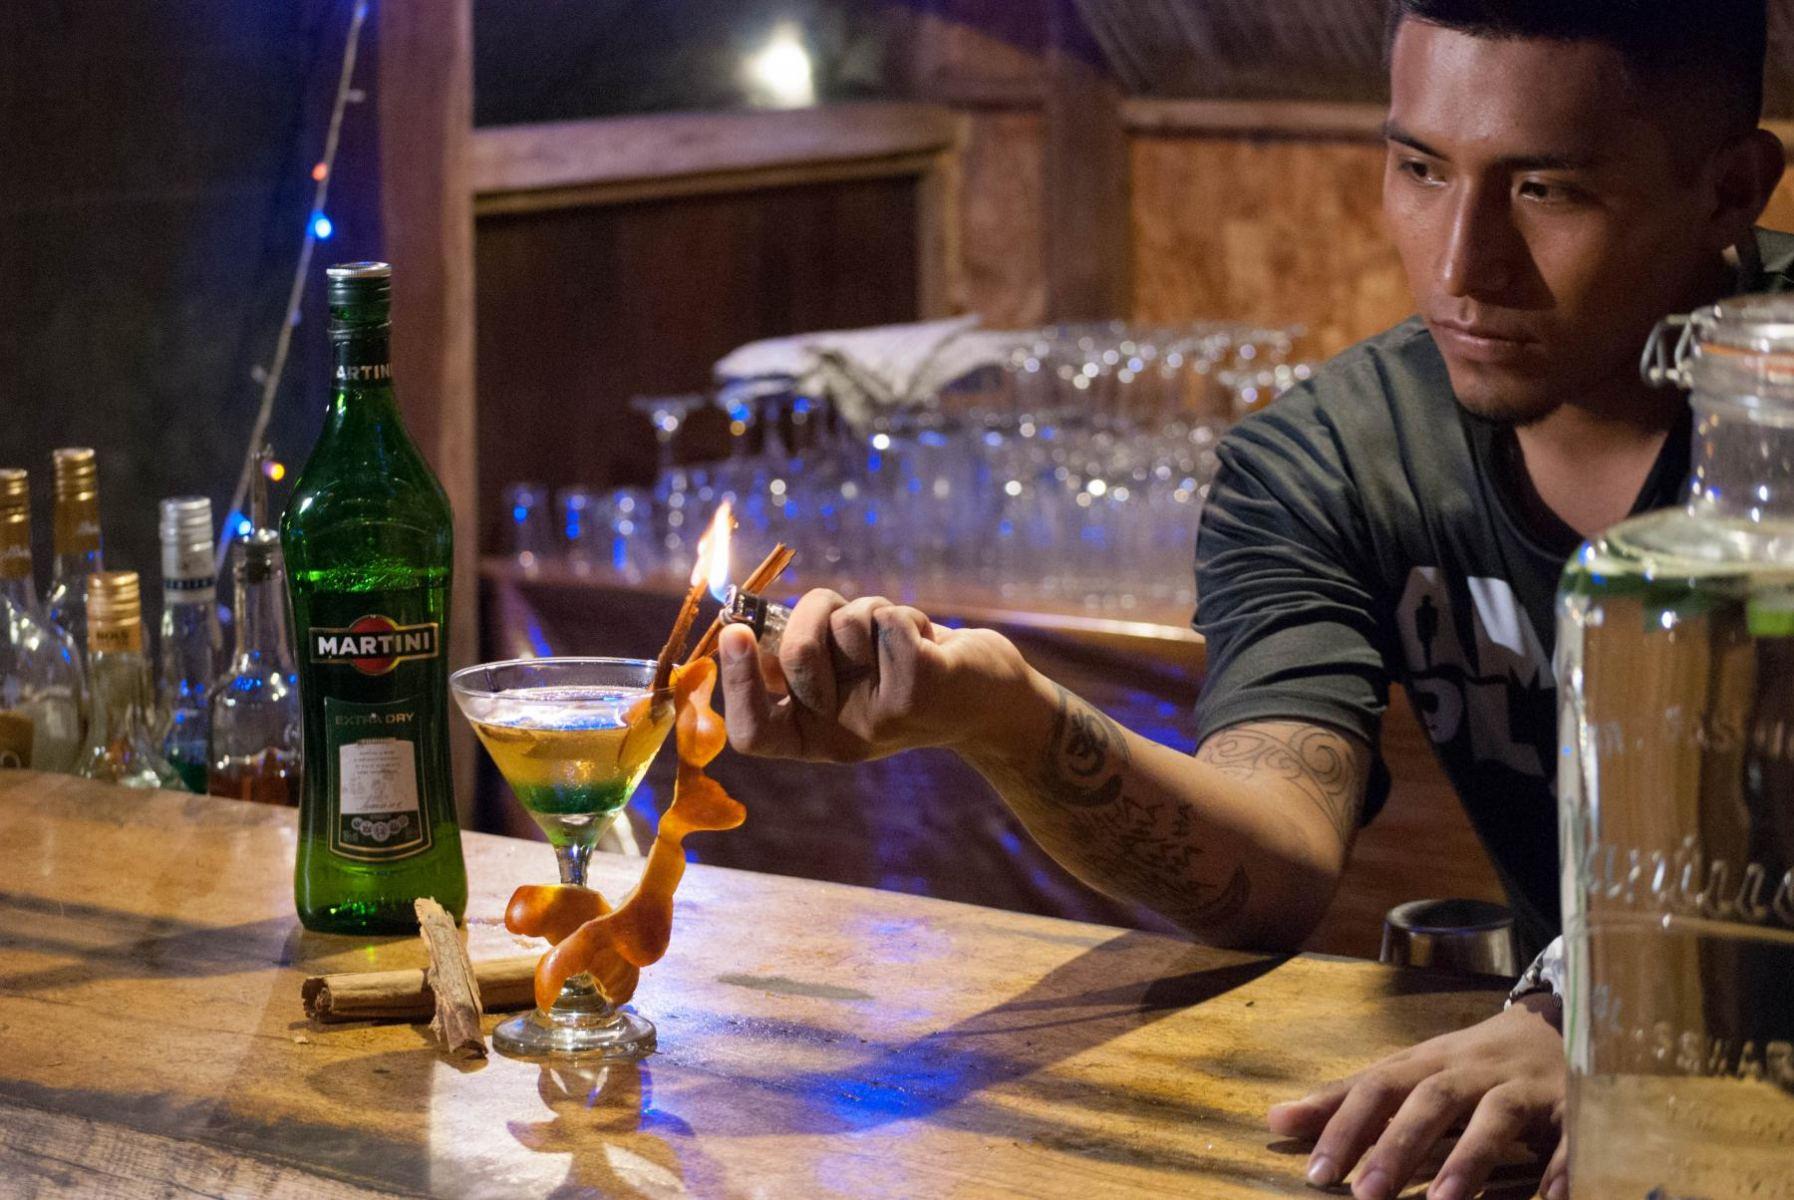 amazon-planet-dinner-room-bar-034